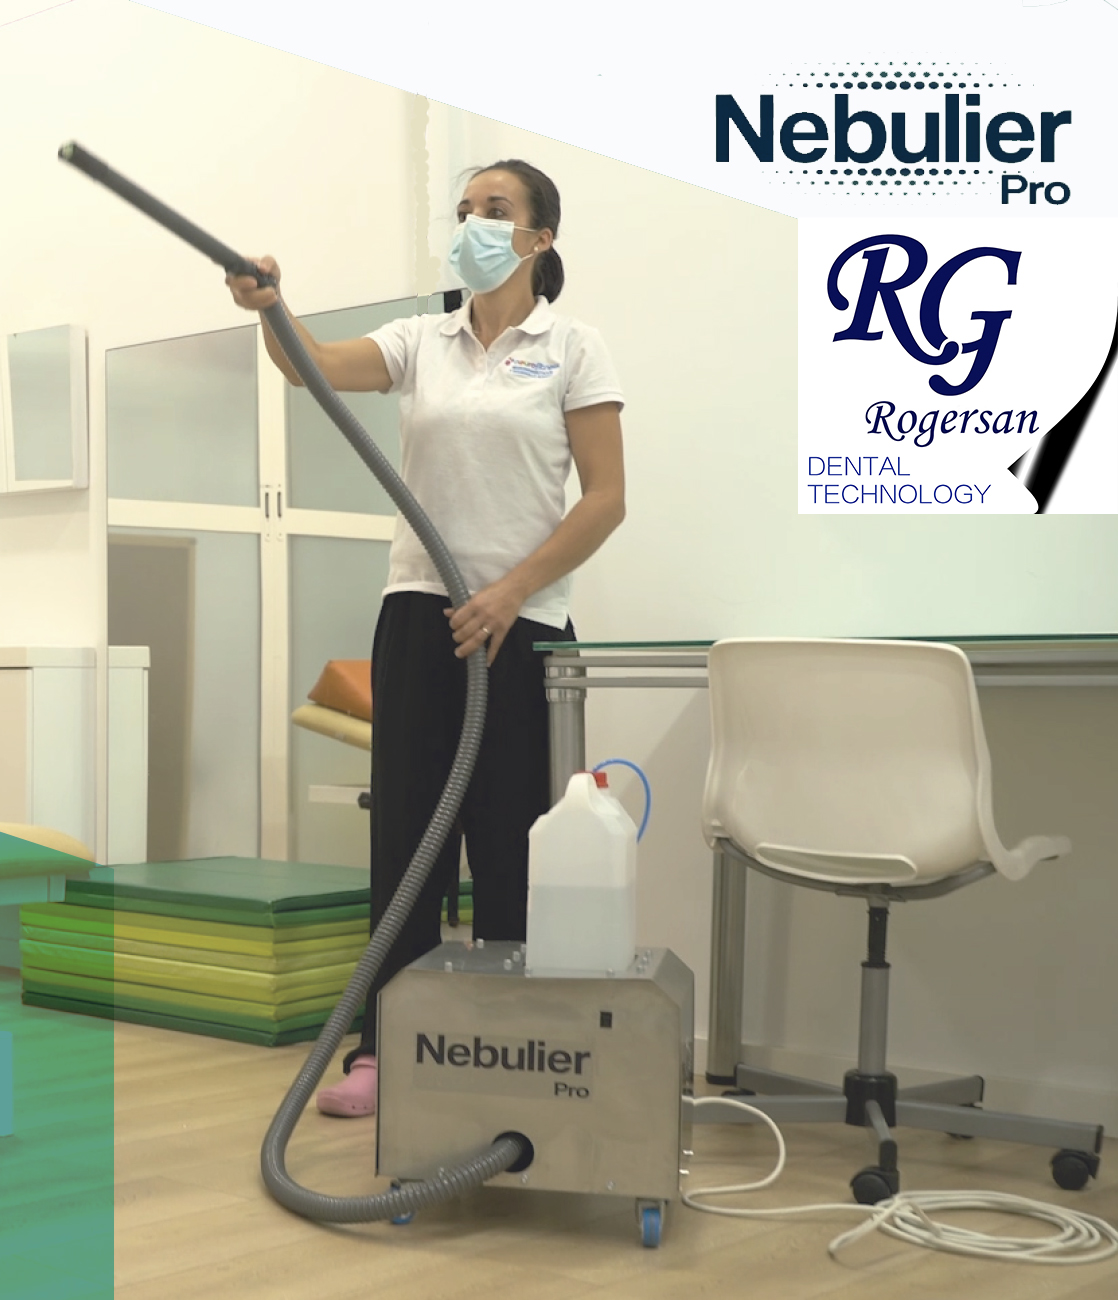 Nebulizador desinfectante Nebulier Pro